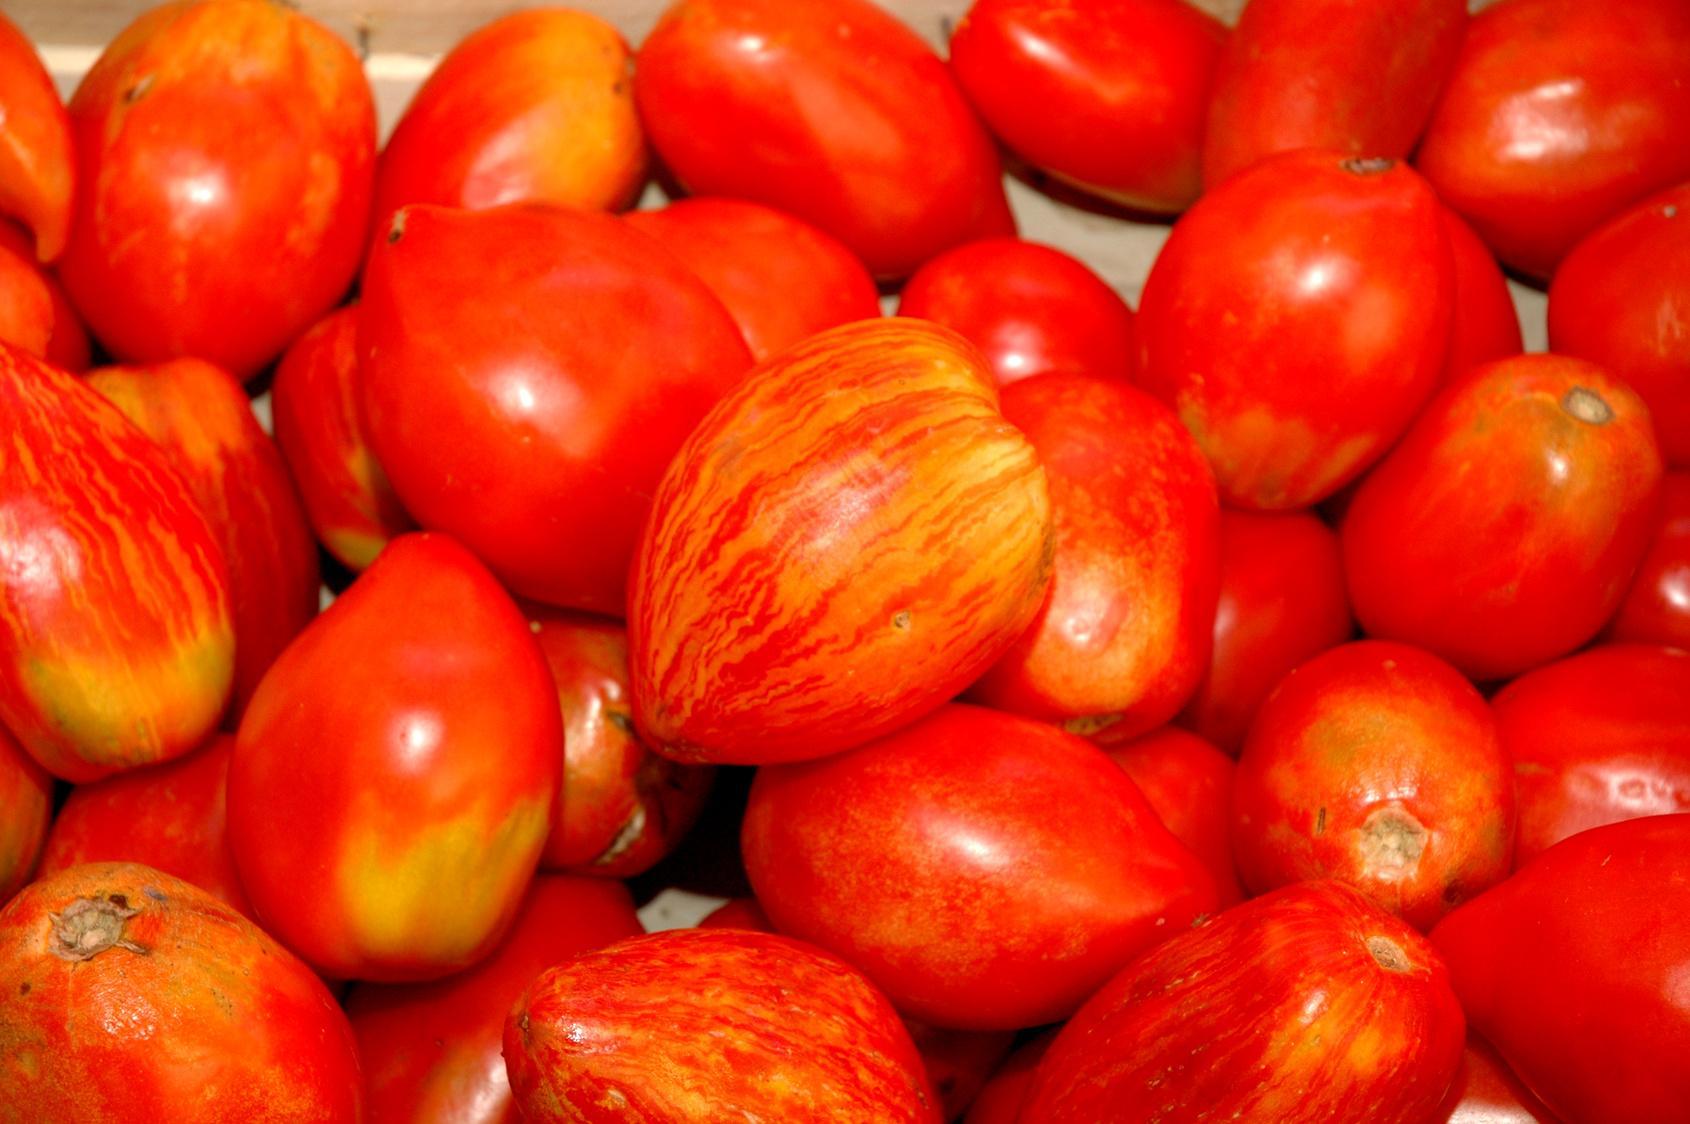 Recettes tomate c ur de b uf cuisine madame figaro - Cuisiner le coeur de boeuf ...